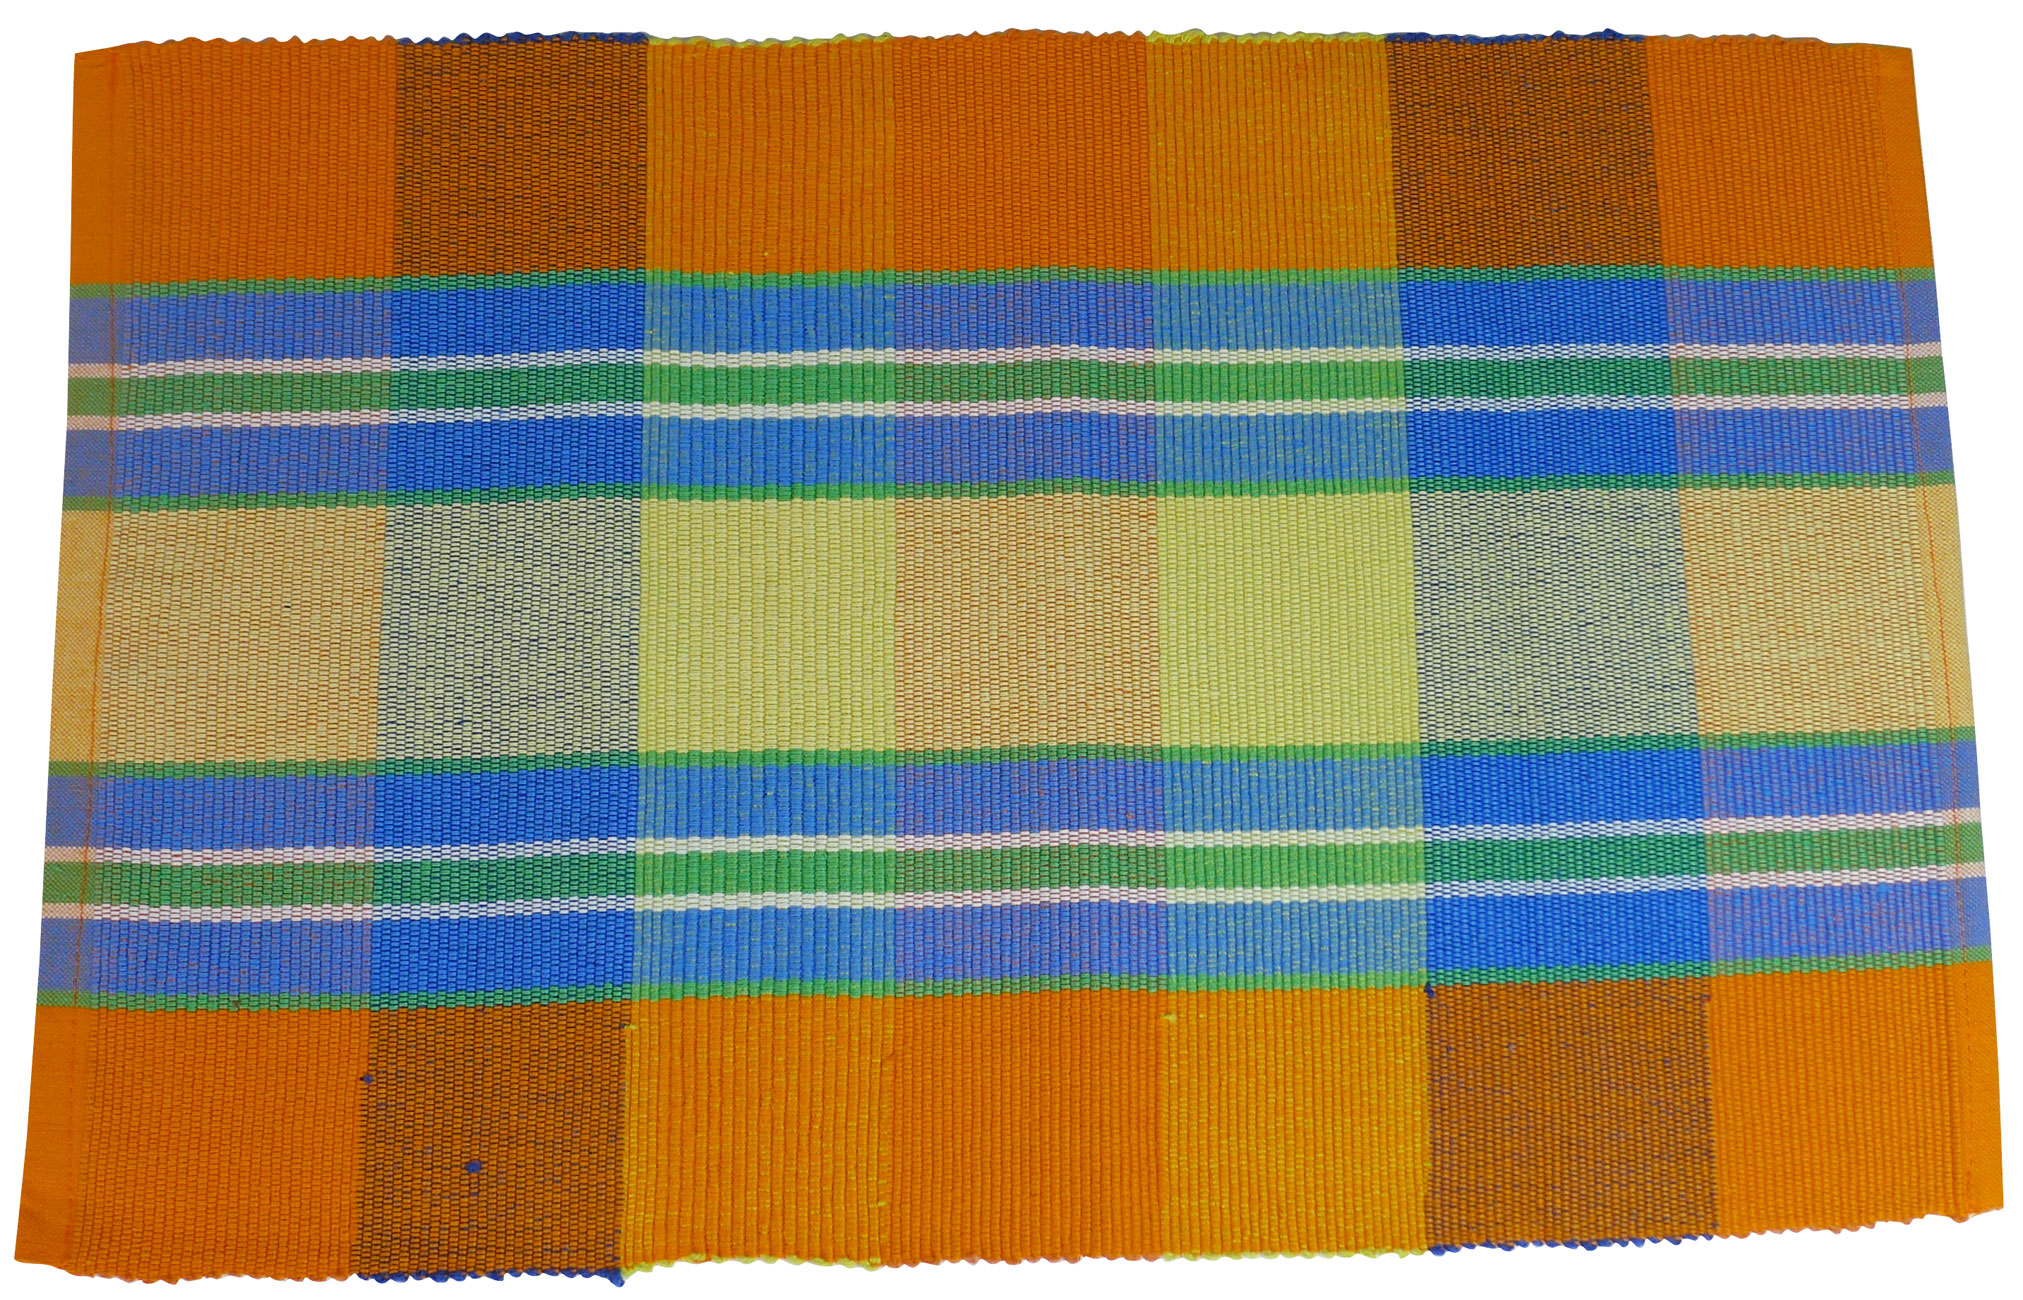 Image of Spiceberry Cotton Placemats - Bright Orange Plaid Design - Set of 4